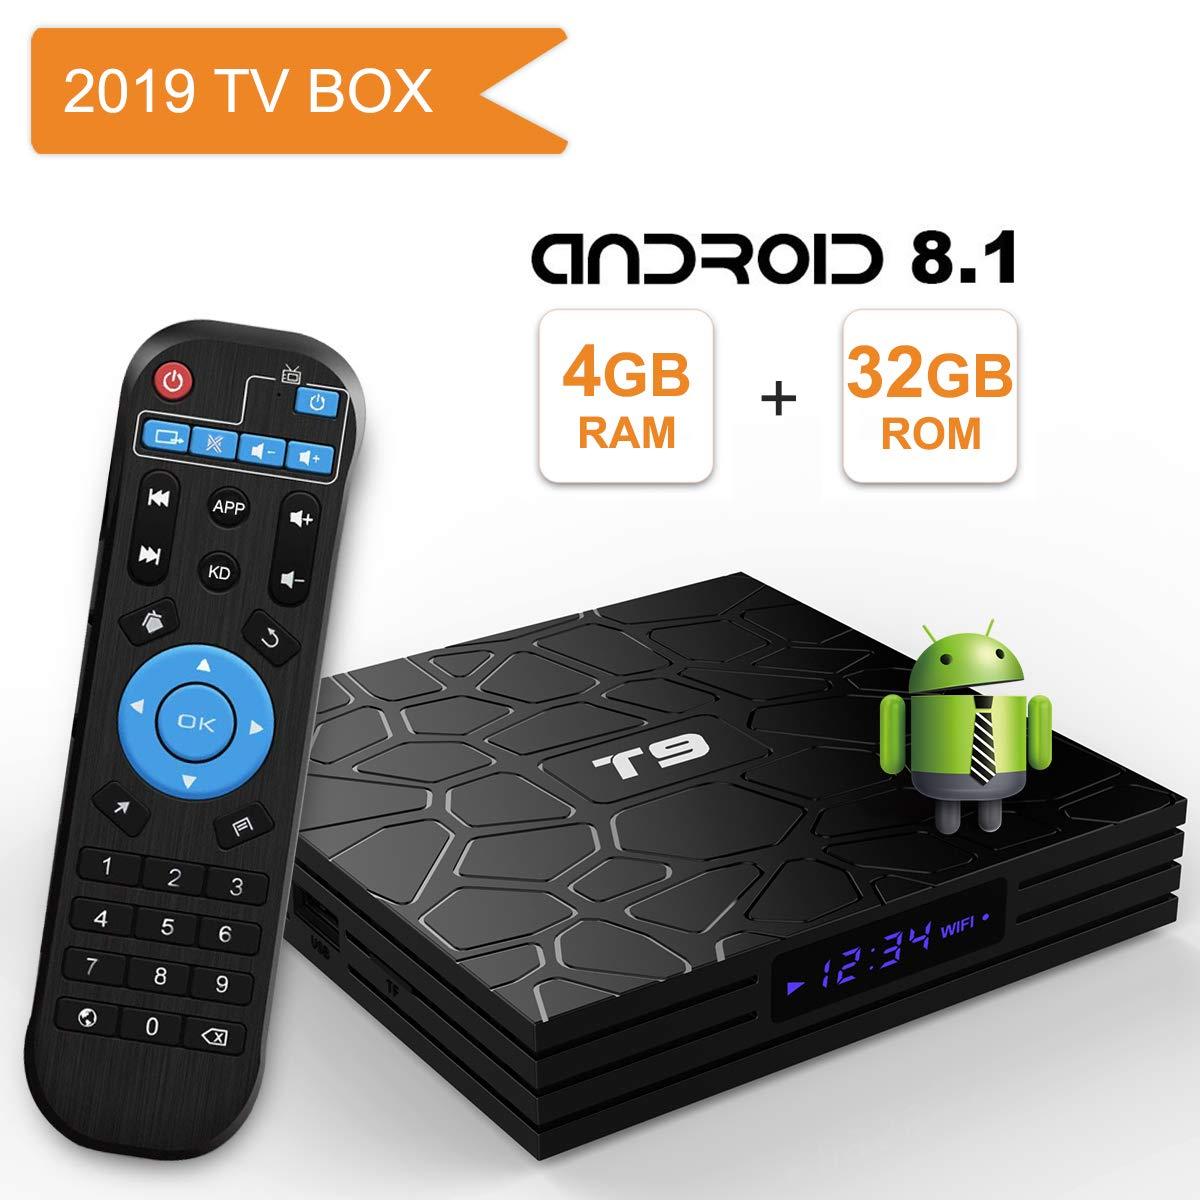 H.265 BT4.1 3D UHD 4K Smart TV Box Android TV Box 8.1,2019 T9 Android Box 4GB RAM 32GB ROM RK3328 Quad Core//2.4GHz//64 bits